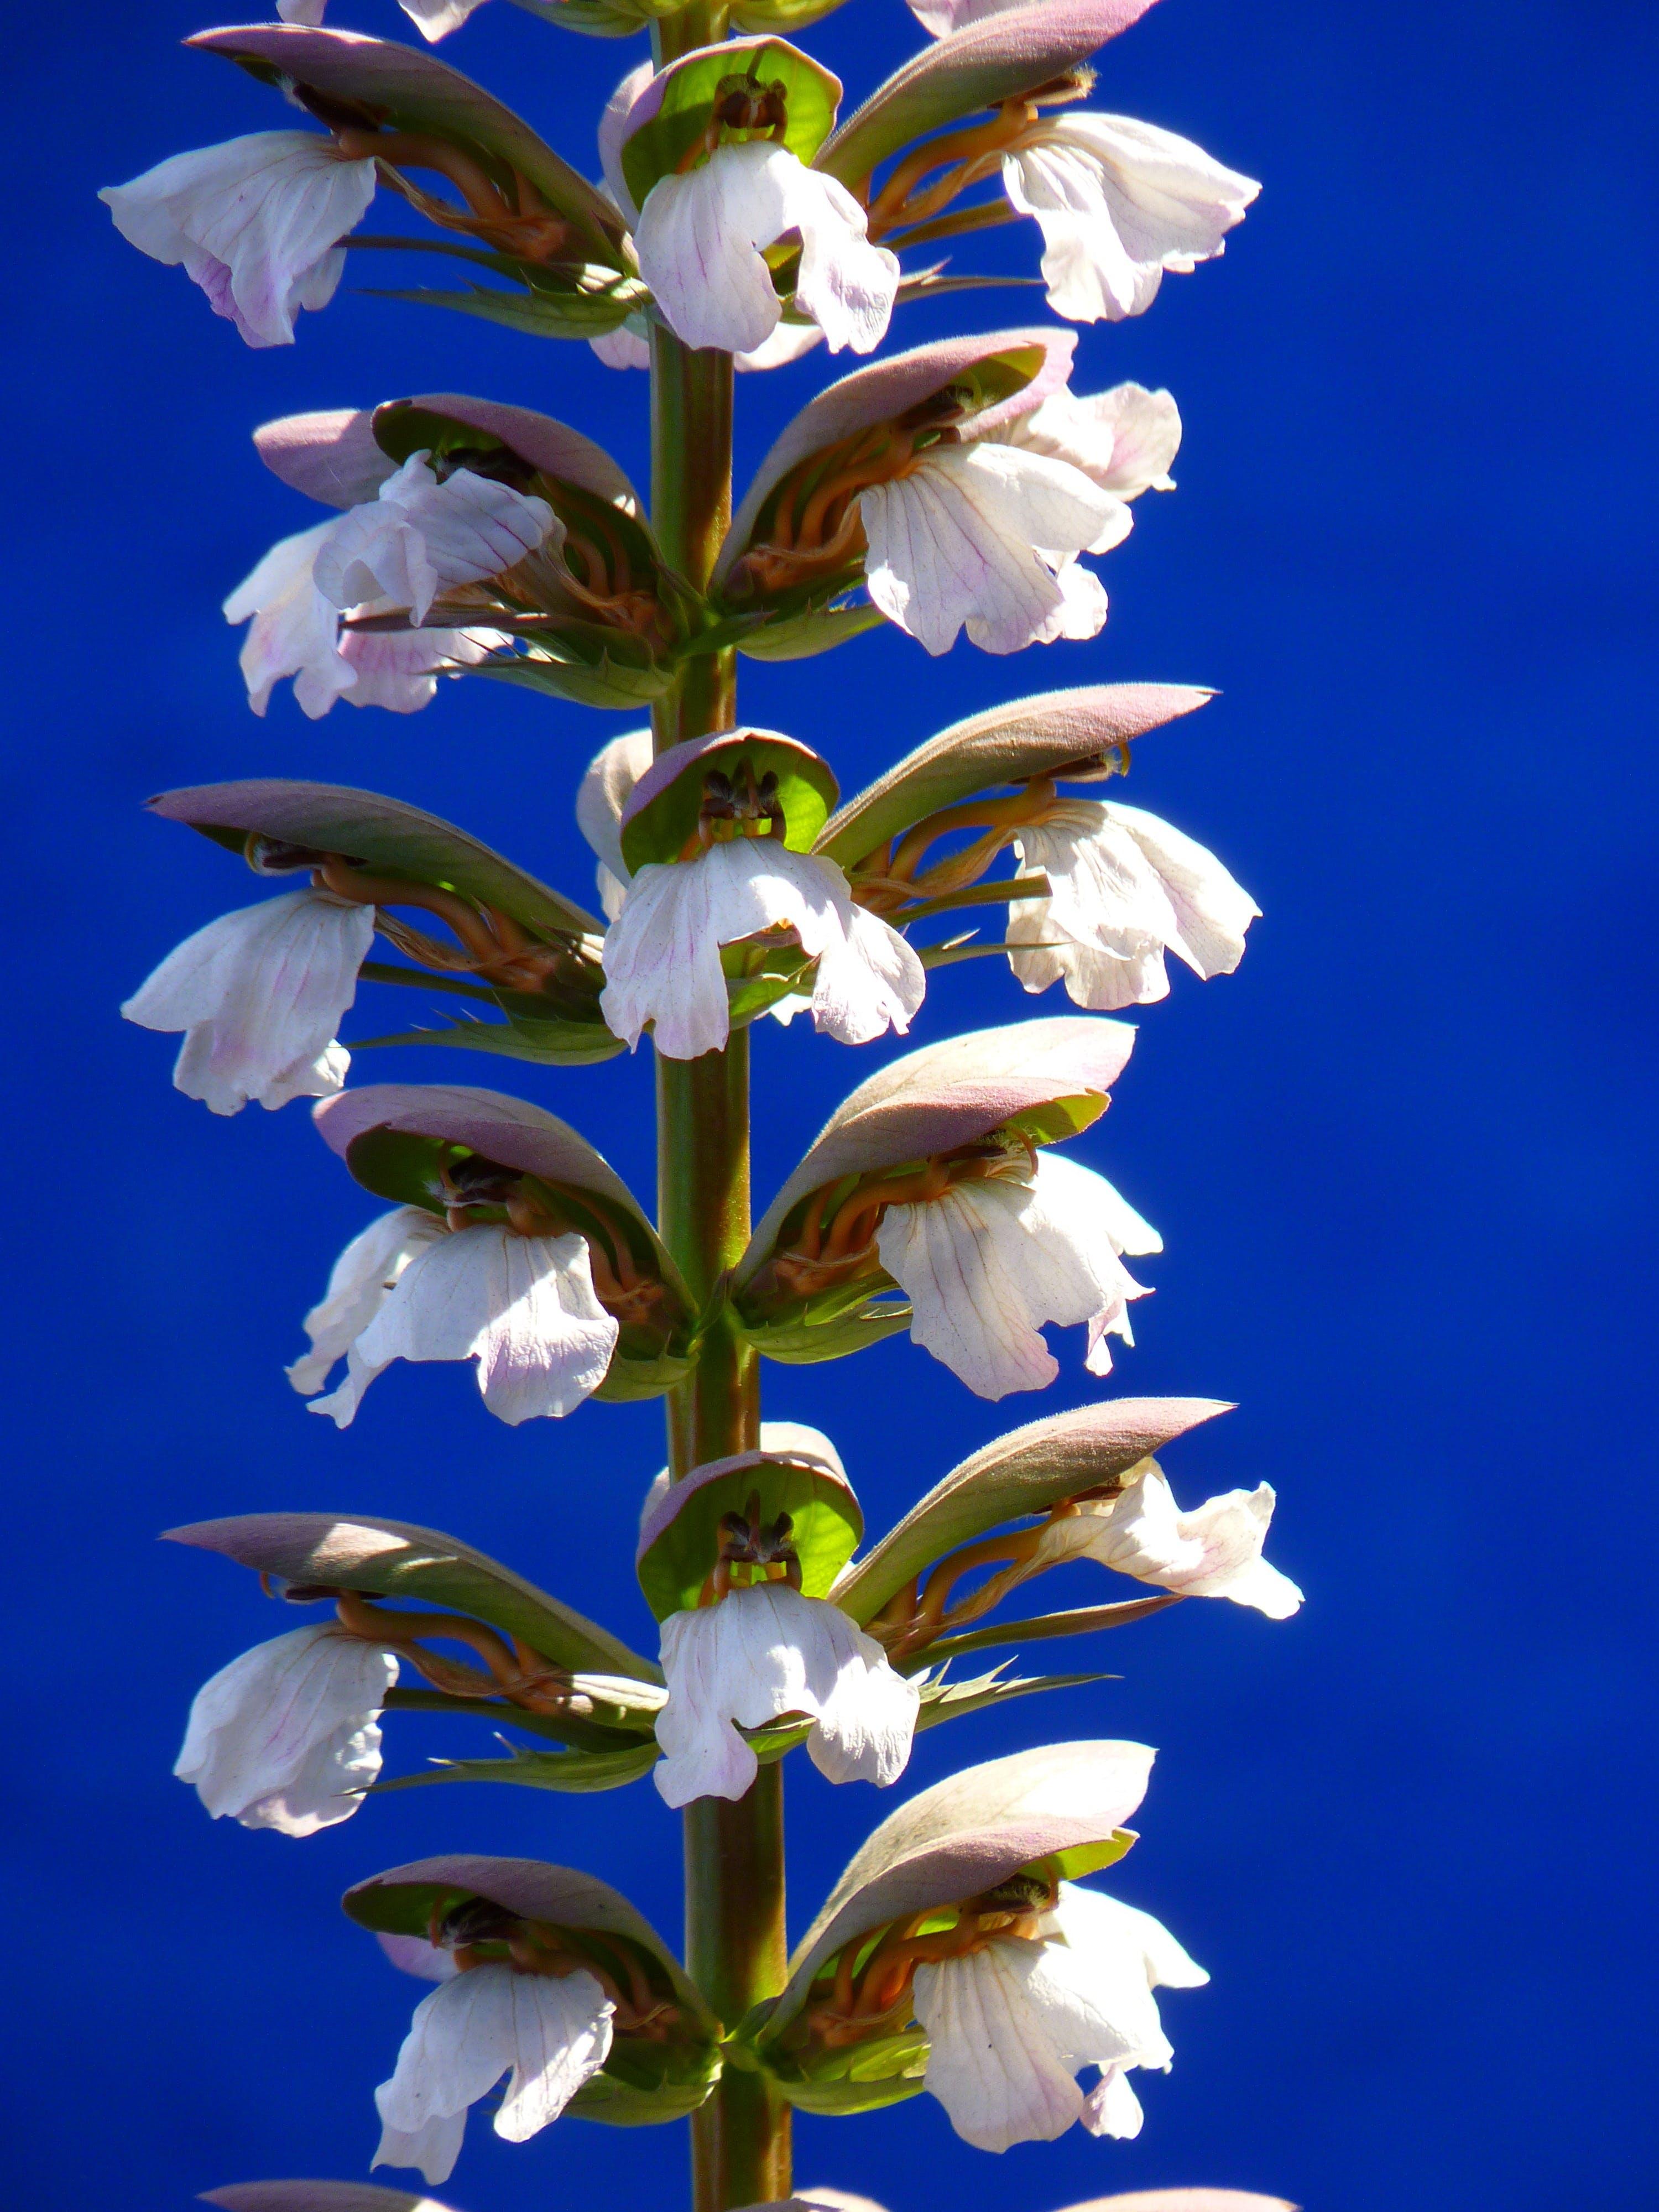 Free stock photo of acanthaceae, acanthus, acanthus hungaricus, acanthus mollis